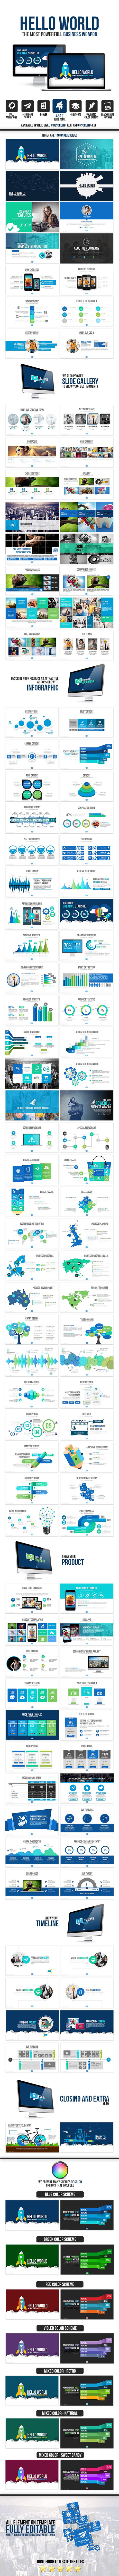 Hello World Presentation Template #powerpoint #presentation Download : https://graphicriver.net/item/hello-world-presentation-template/10186069 ?ref=BrandEarth